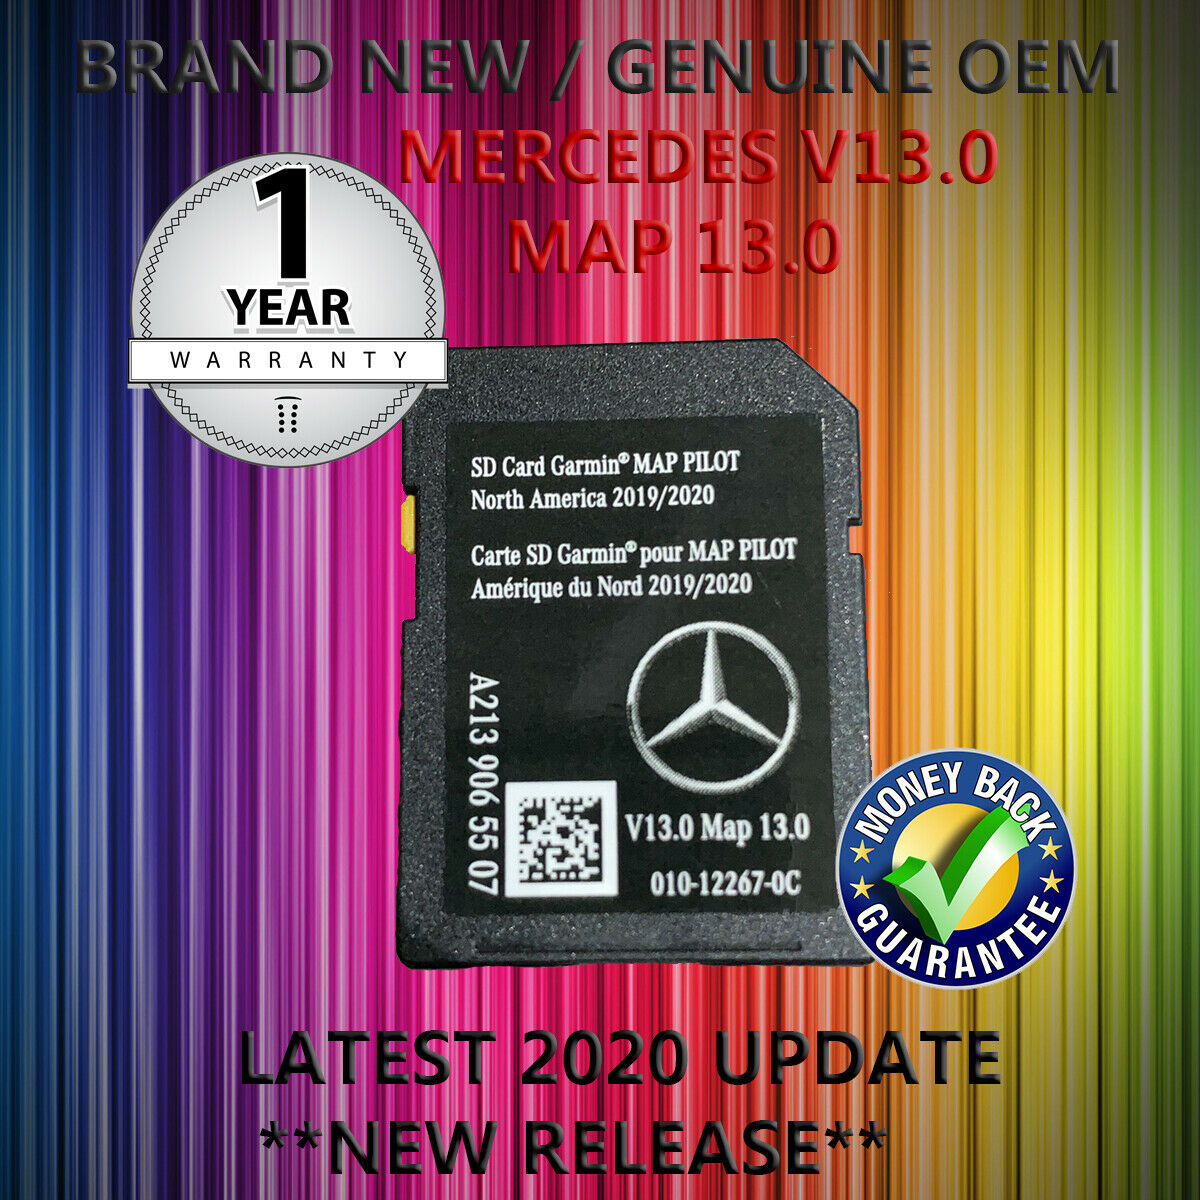 2020 V13 Mercedes GARMIN MAP PILOT SD CARD SAT NAV A B CLA E GLS GLA GLE,GL,M